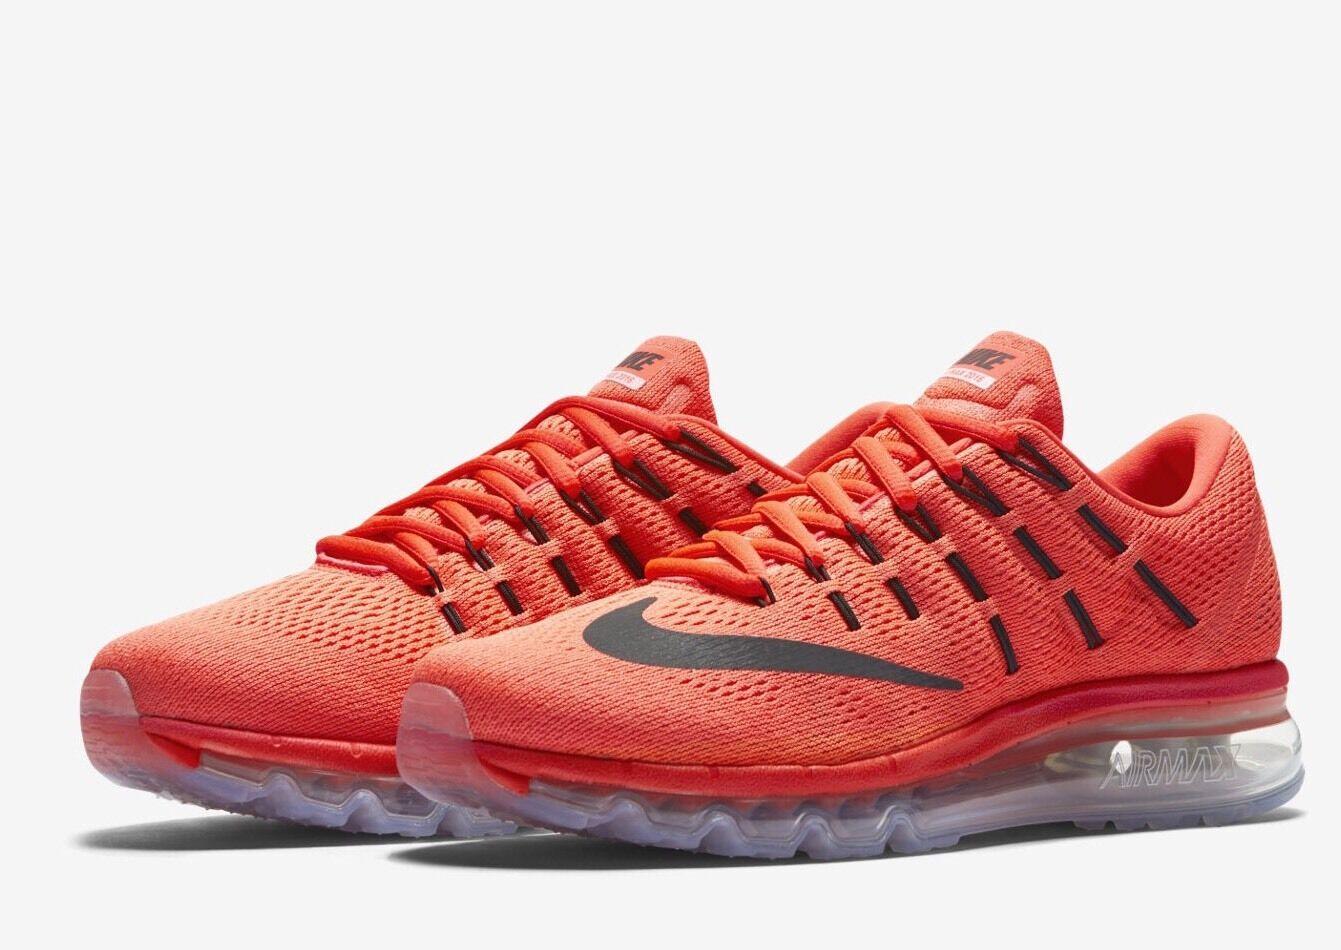 Nike Wmns Wmns Wmns Air Max 2016 Negro carmesí brillante Talla UK 4.5 EU 38 nos 7 806772-600  primera vez respuesta